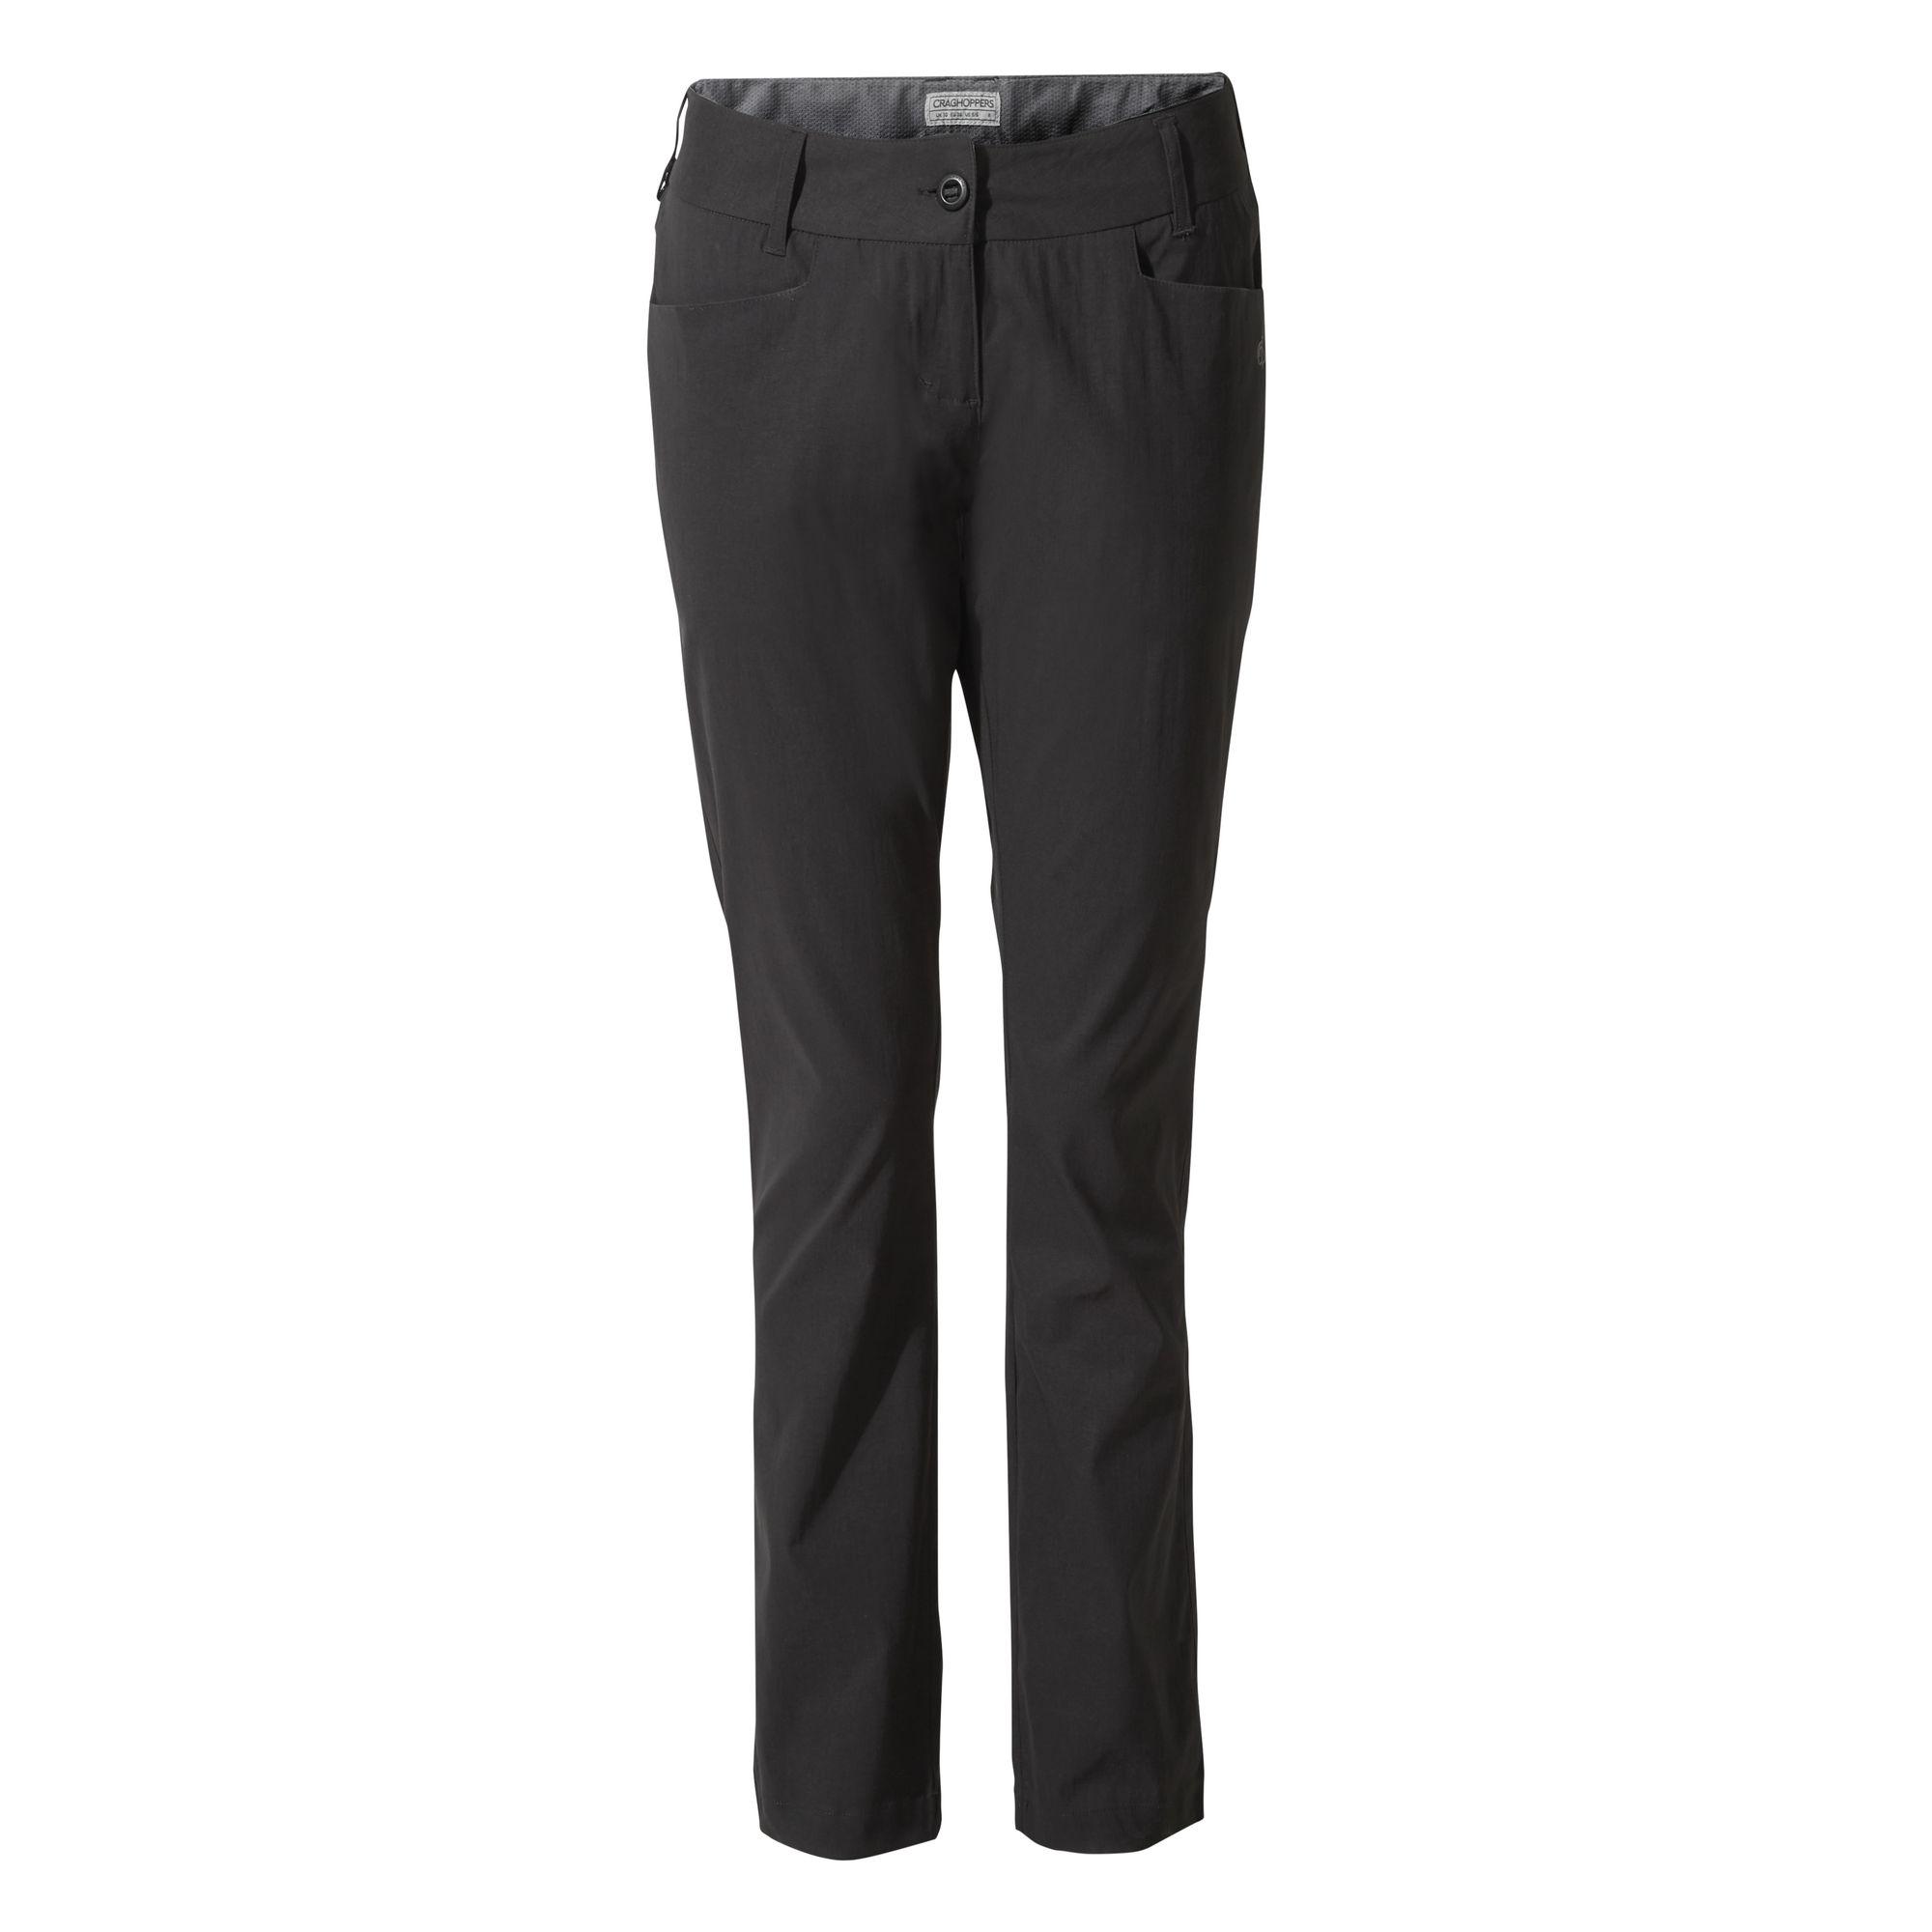 Craghoppers-Pantalon-CLARA-Femme-CG1066 miniature 14